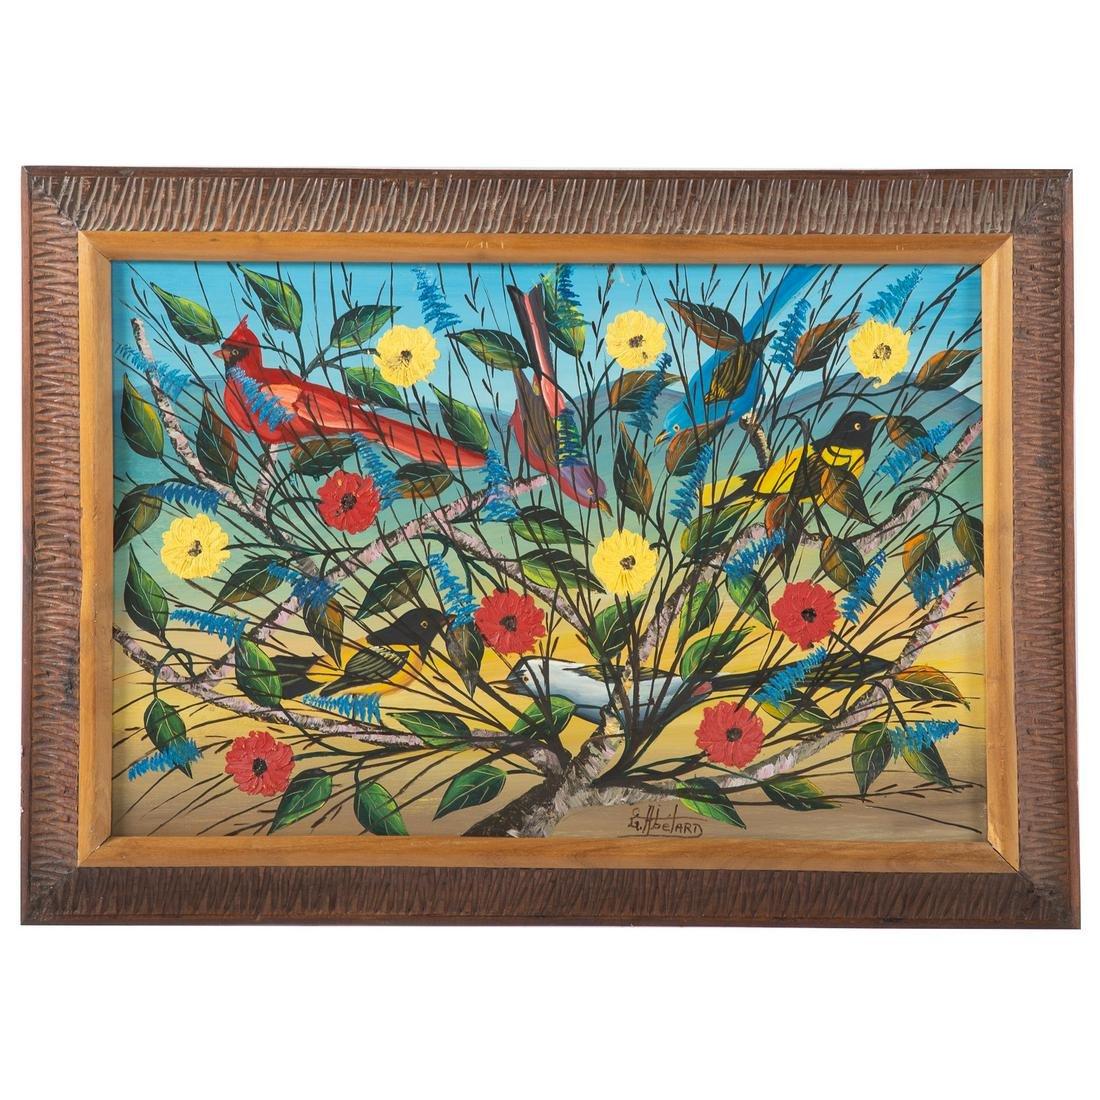 Gesner Abelard. Birds On A Branch